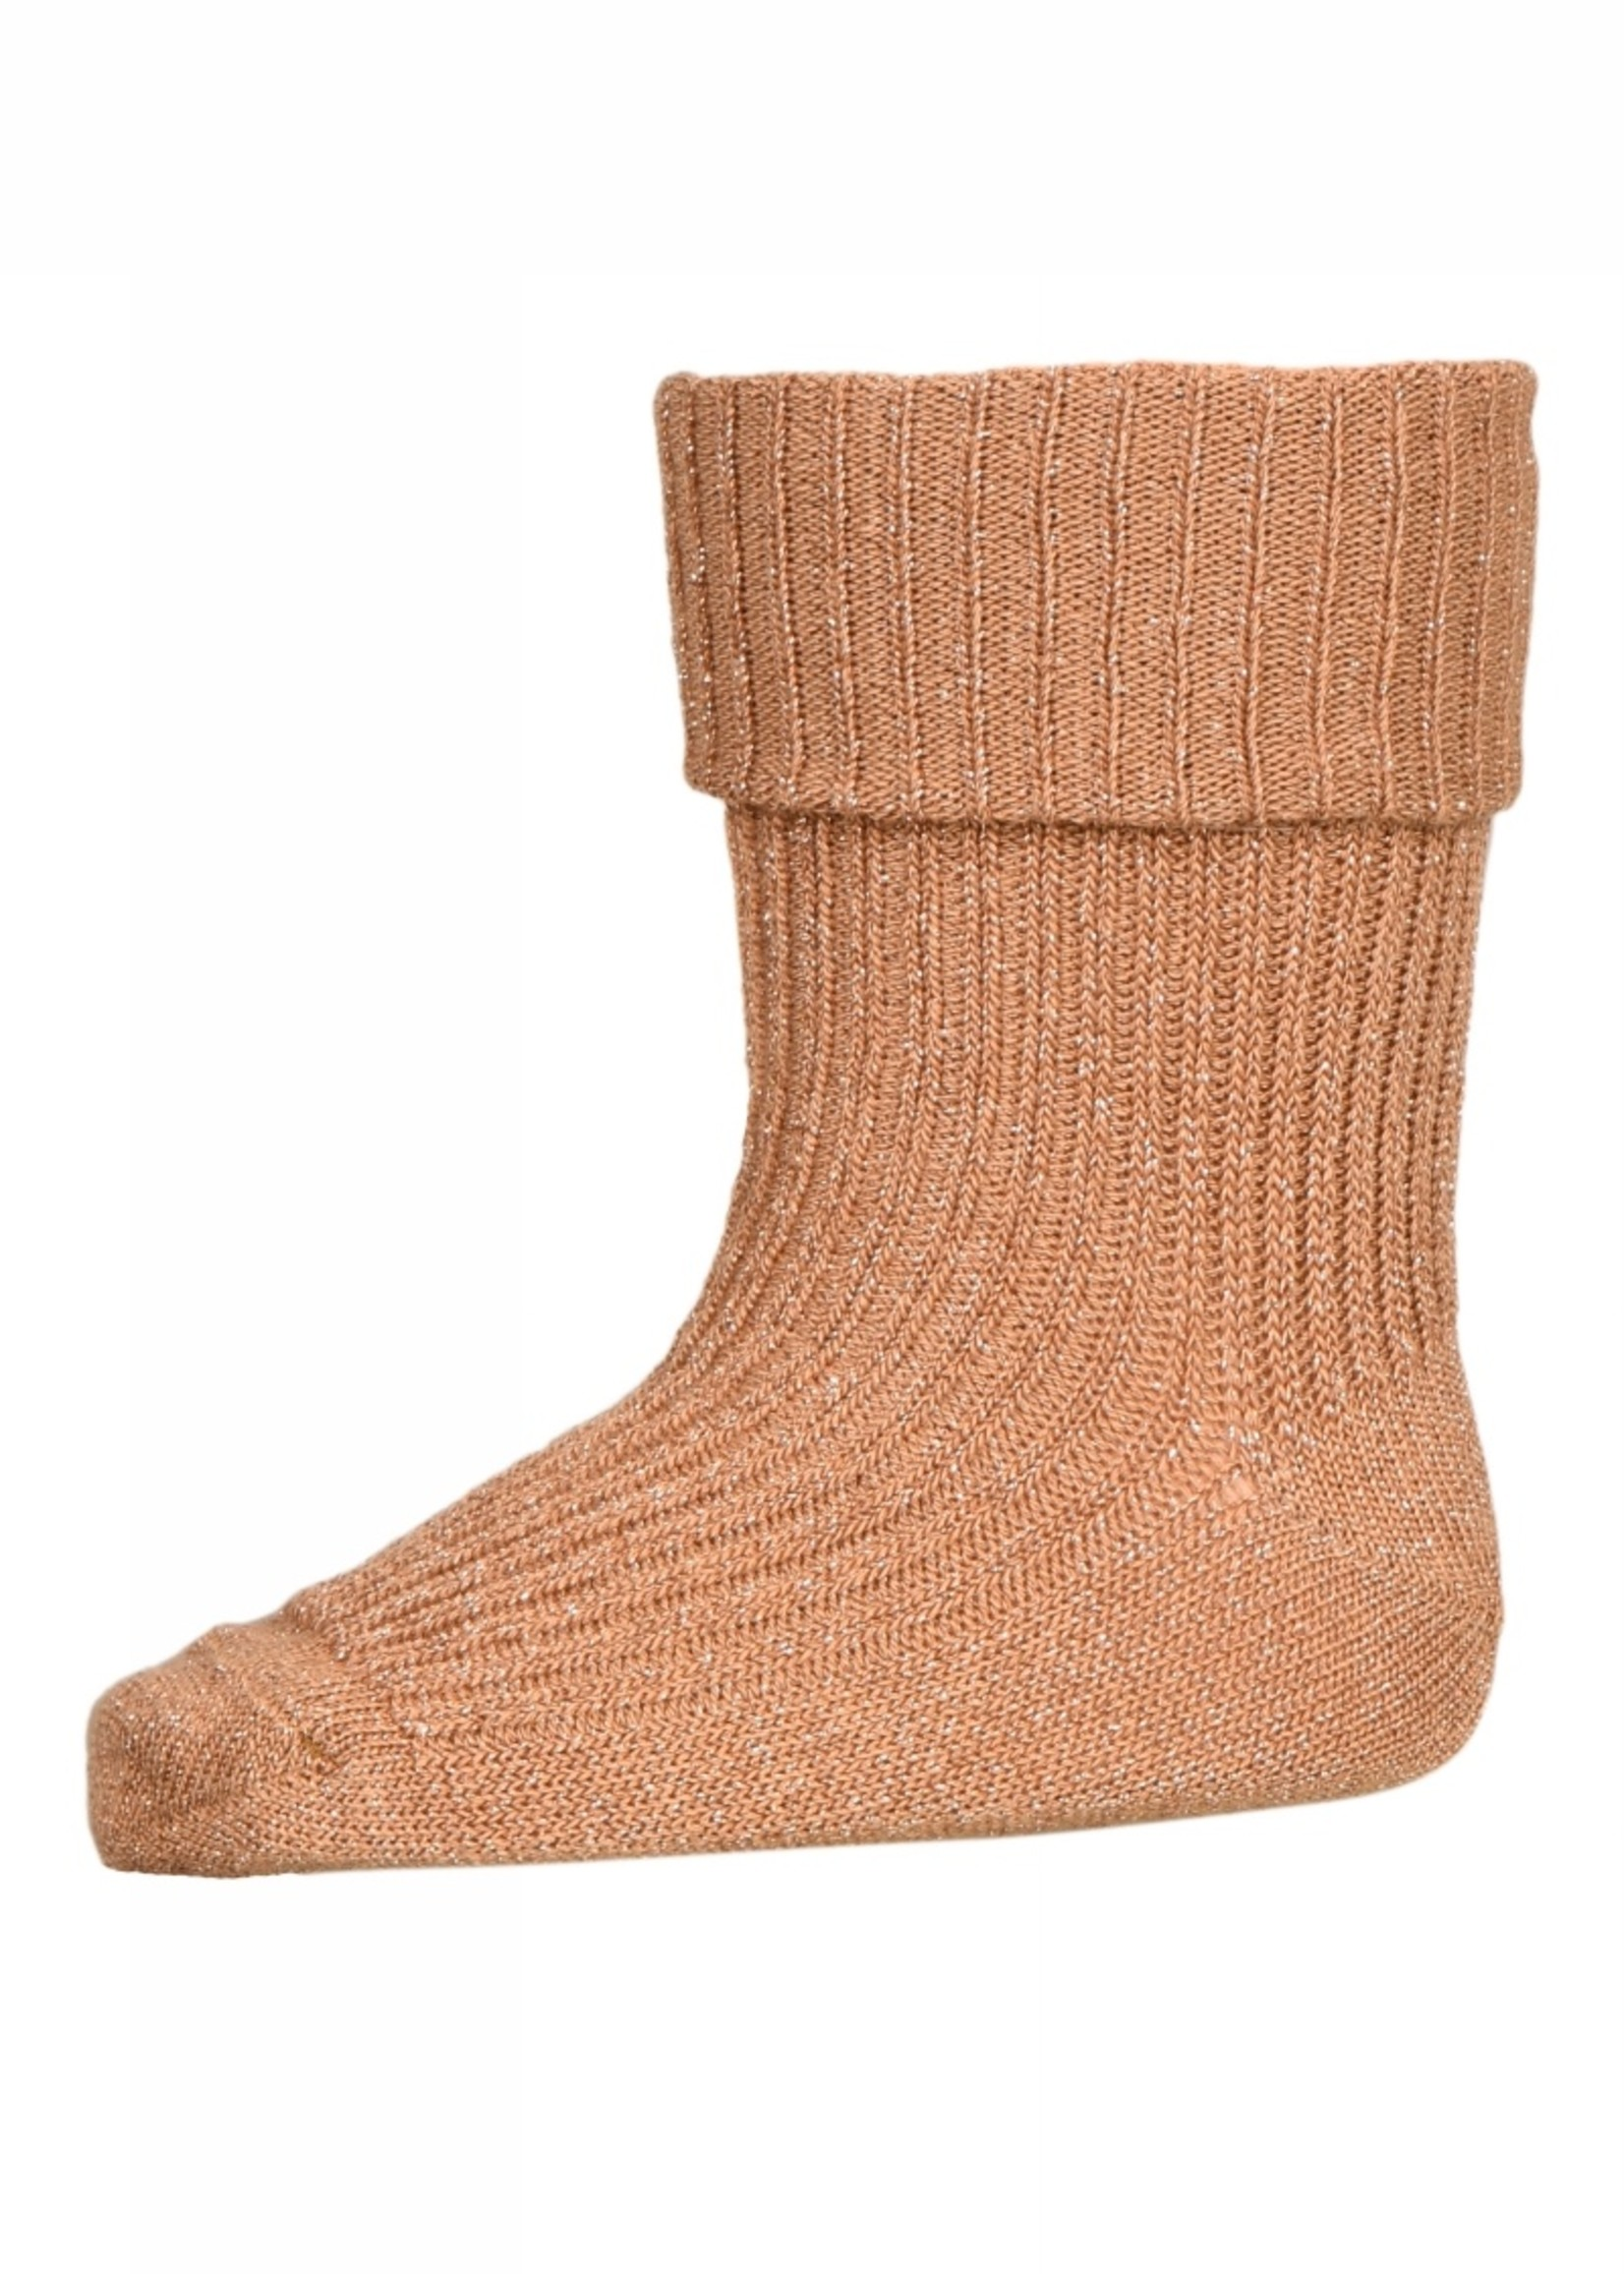 MP Denmark Ida glitter socks - Apple Cinnamon